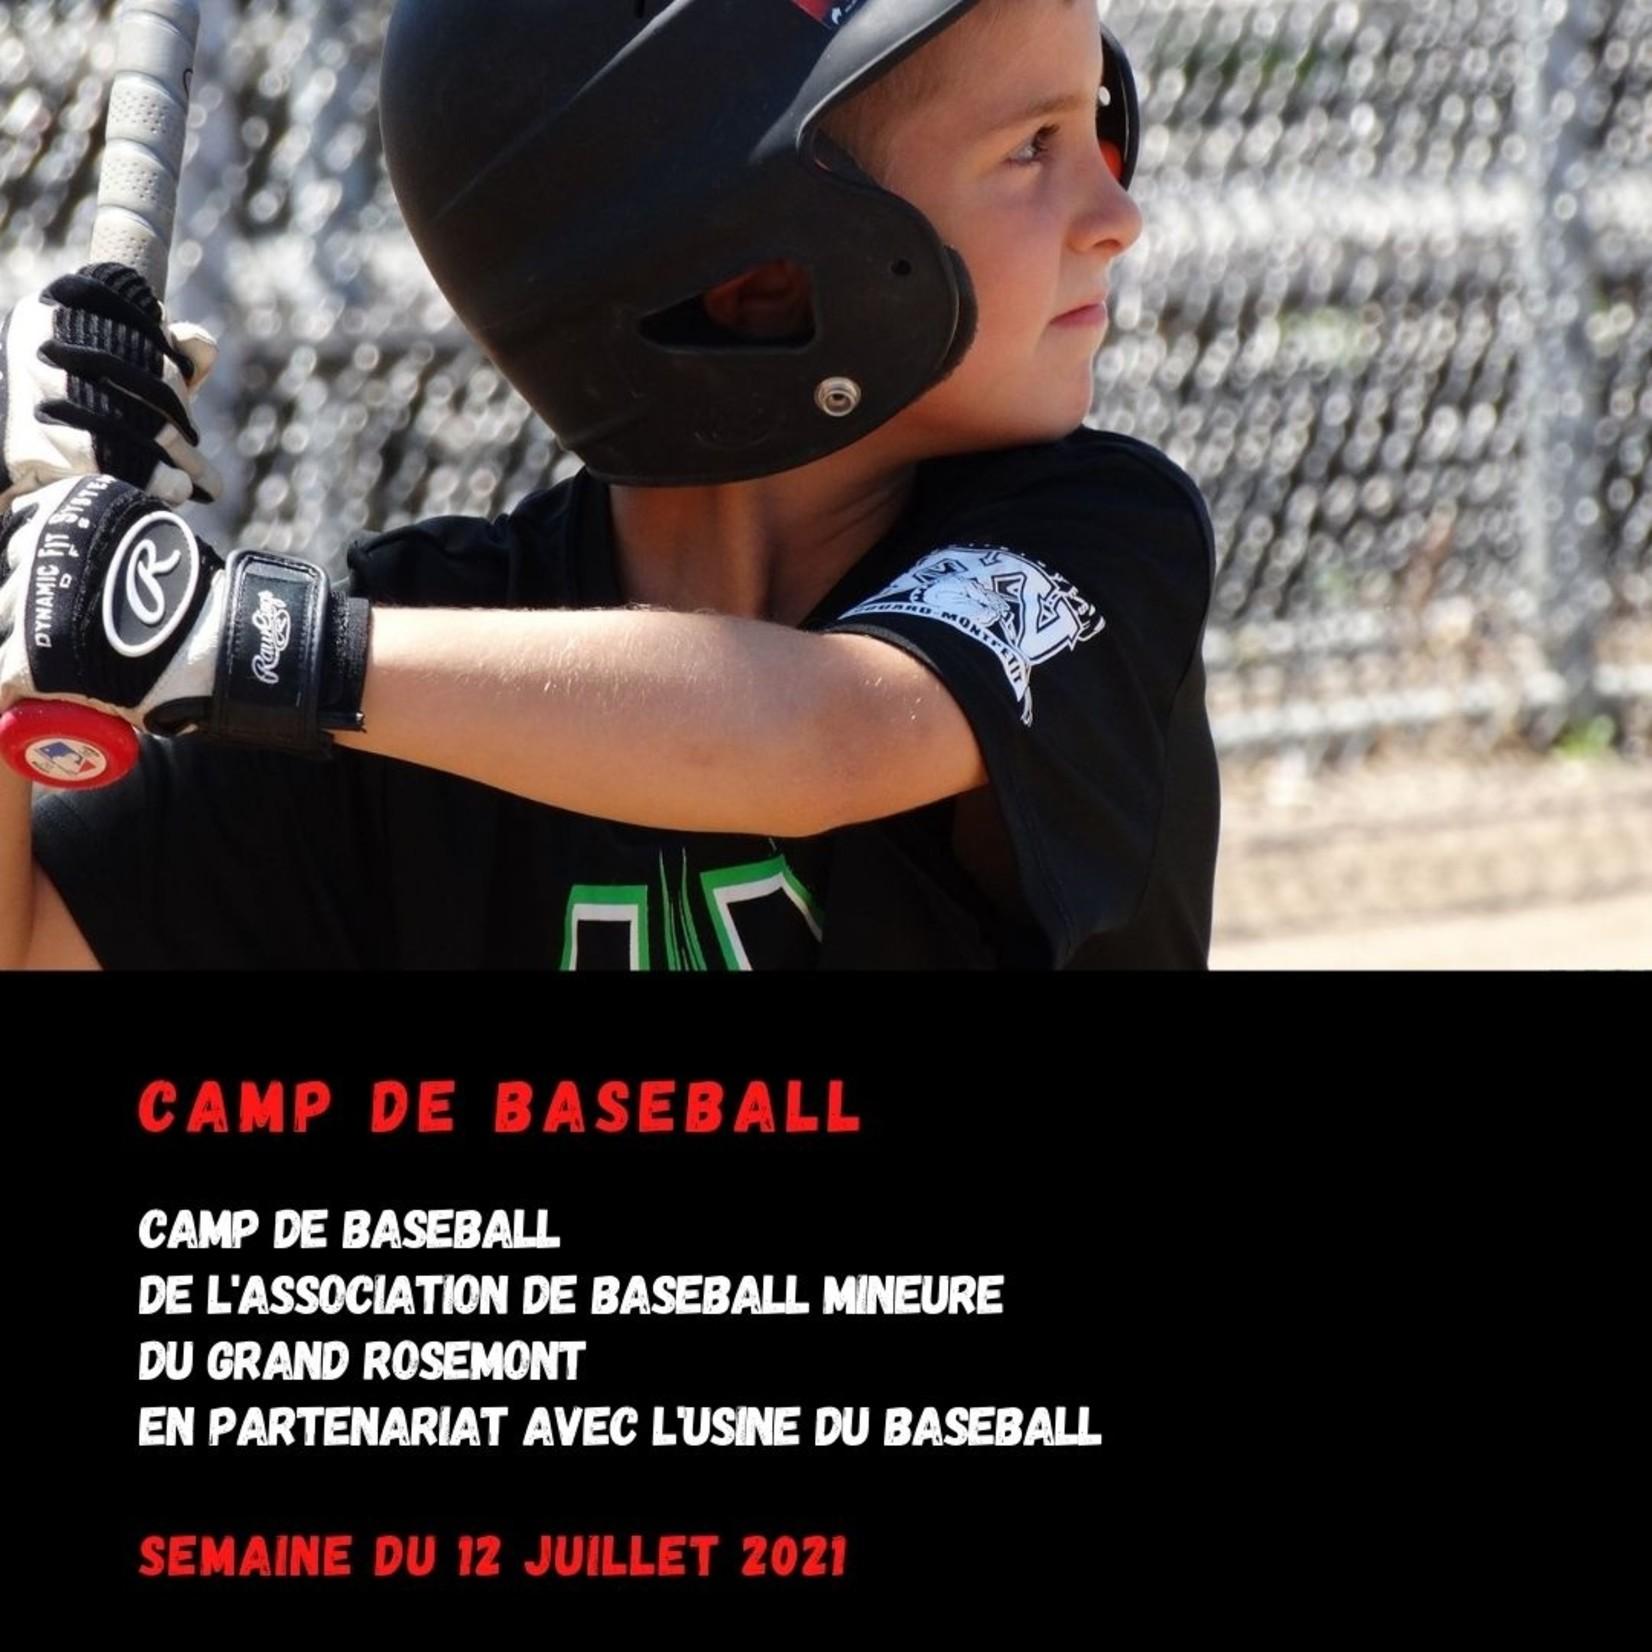 Copy of Camp baseball Rosemont 12 juillet U10 (9-10 ans)